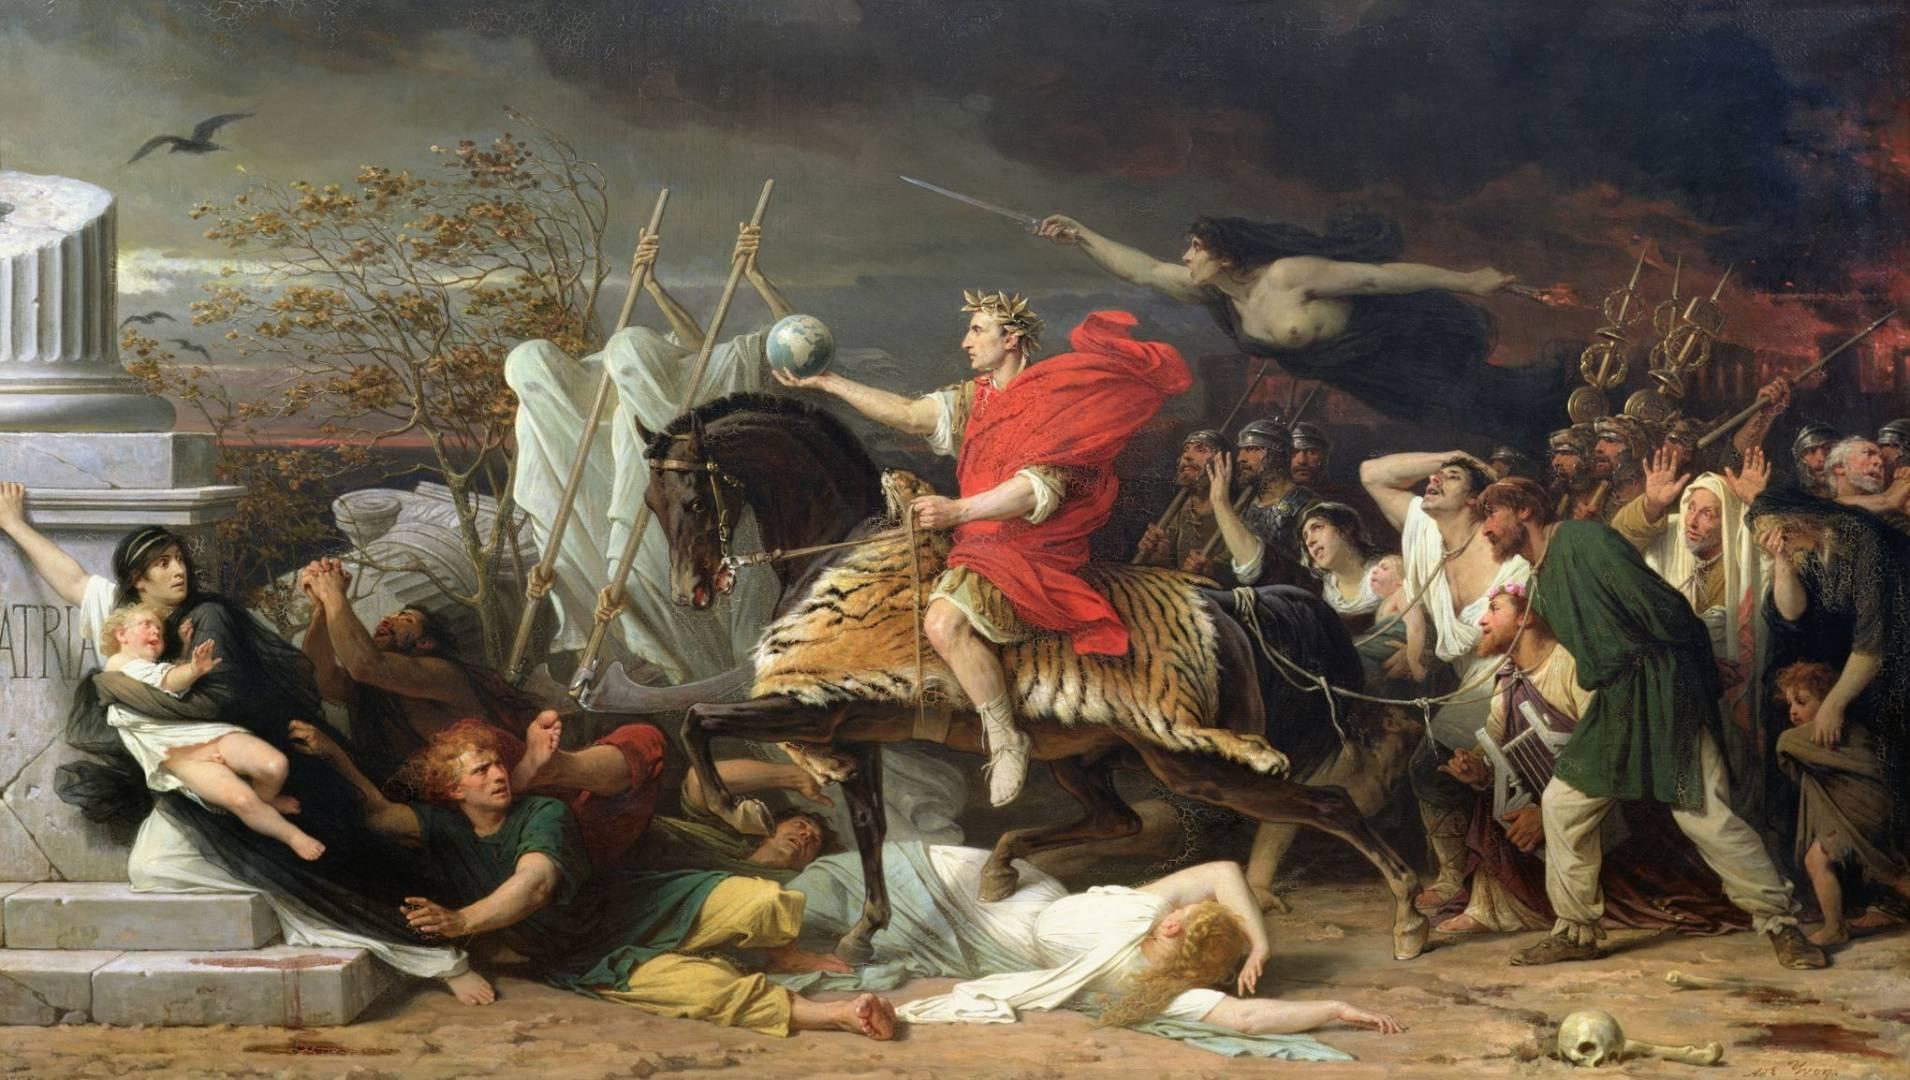 Цезарь. Картина Адольфа Ивона, 1875 год